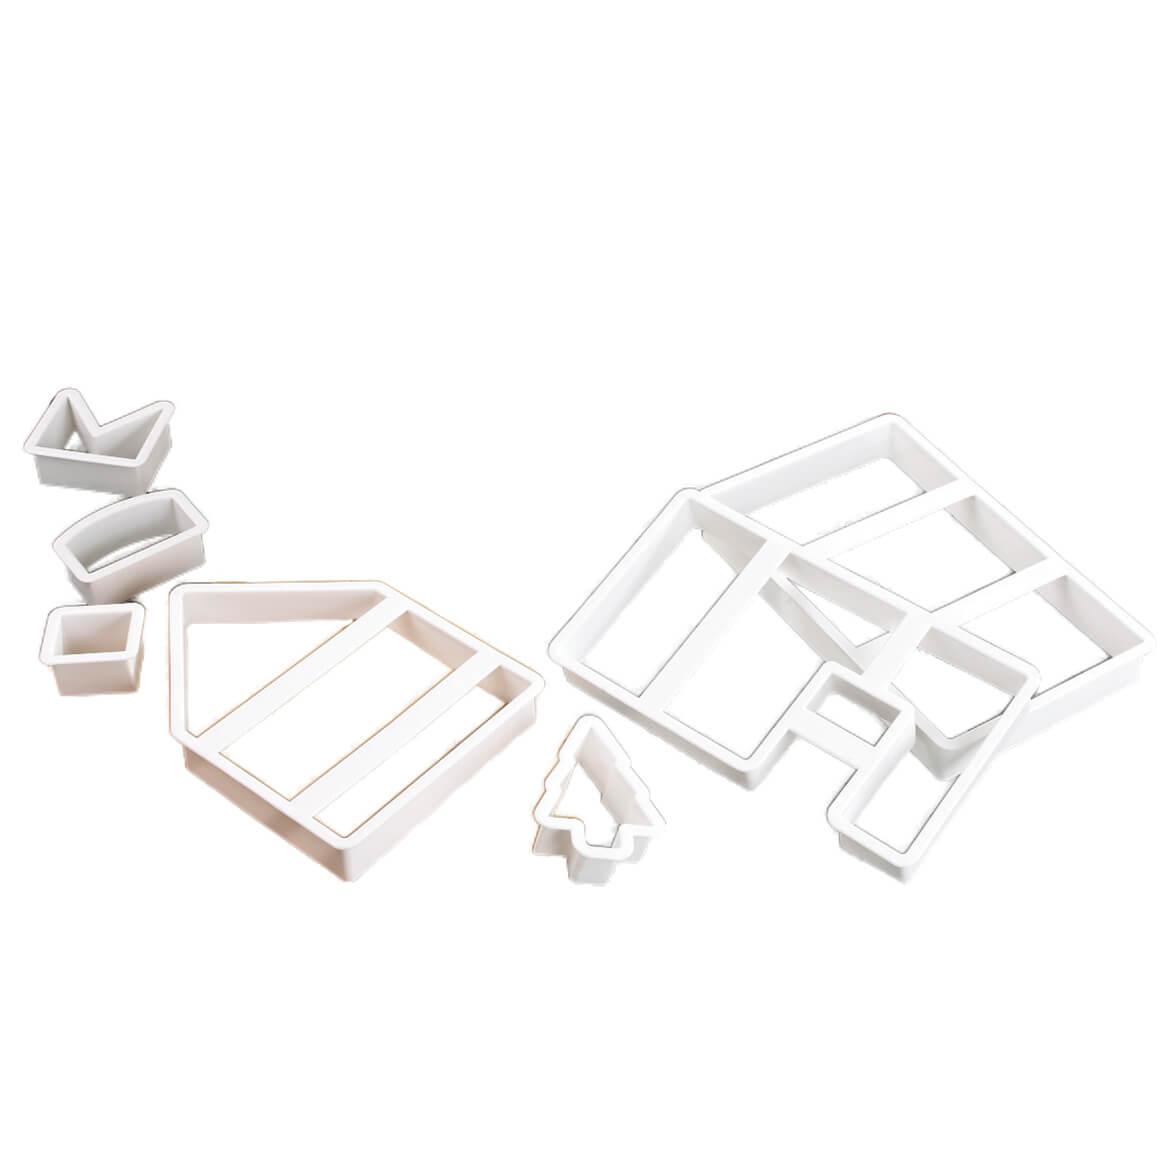 Gingerbread House Kit-369912